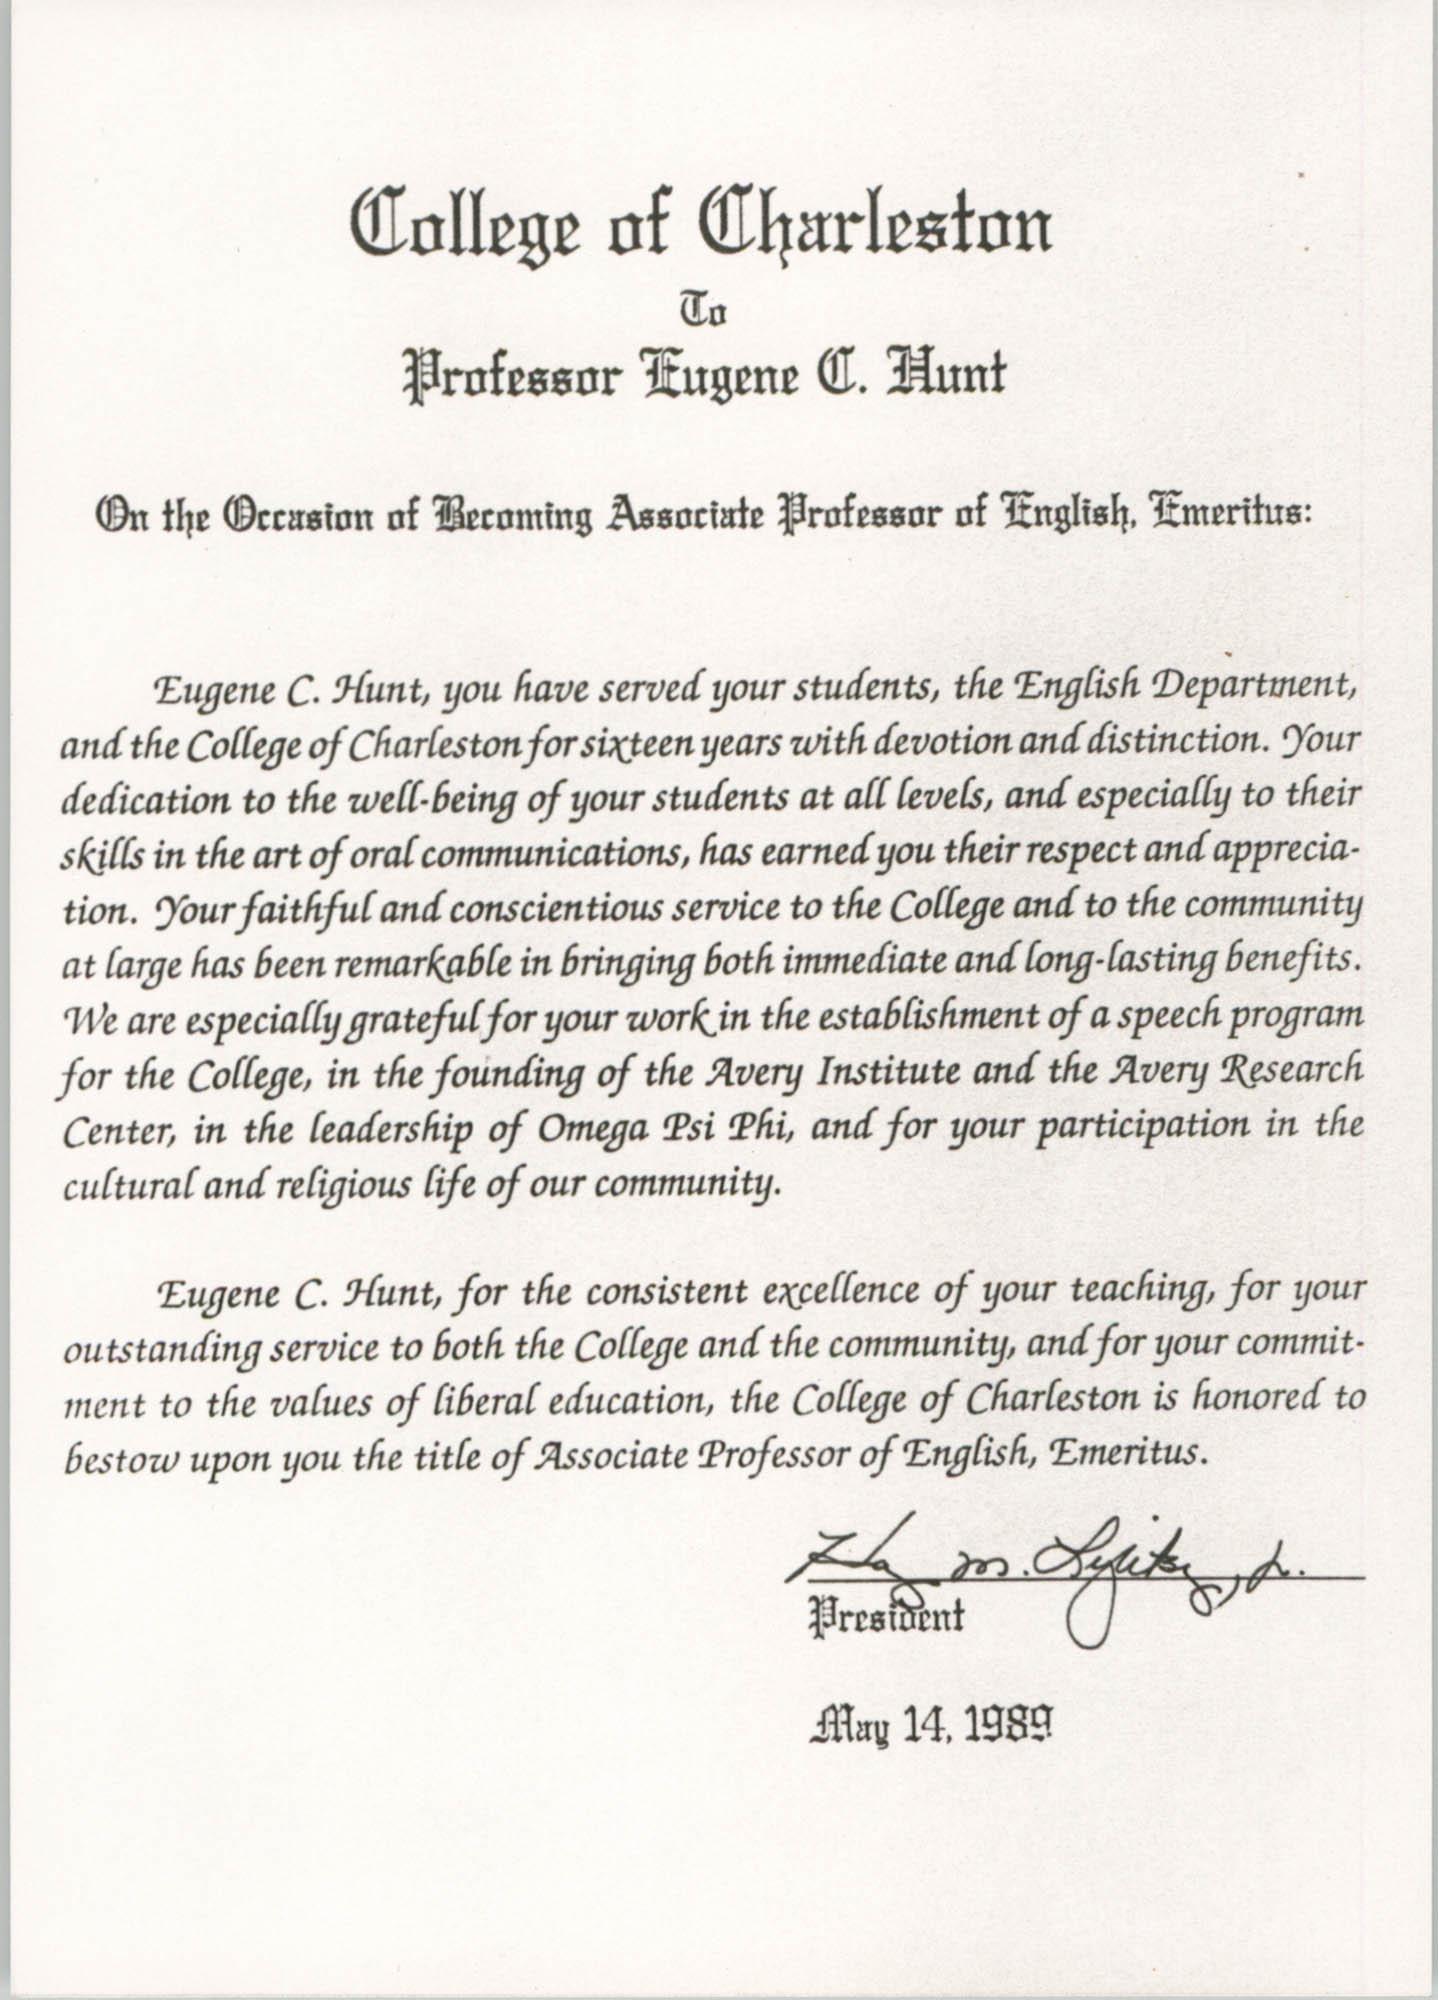 Professor Eugene C. Hunt, Associate Professor of English Emeritus Certificate